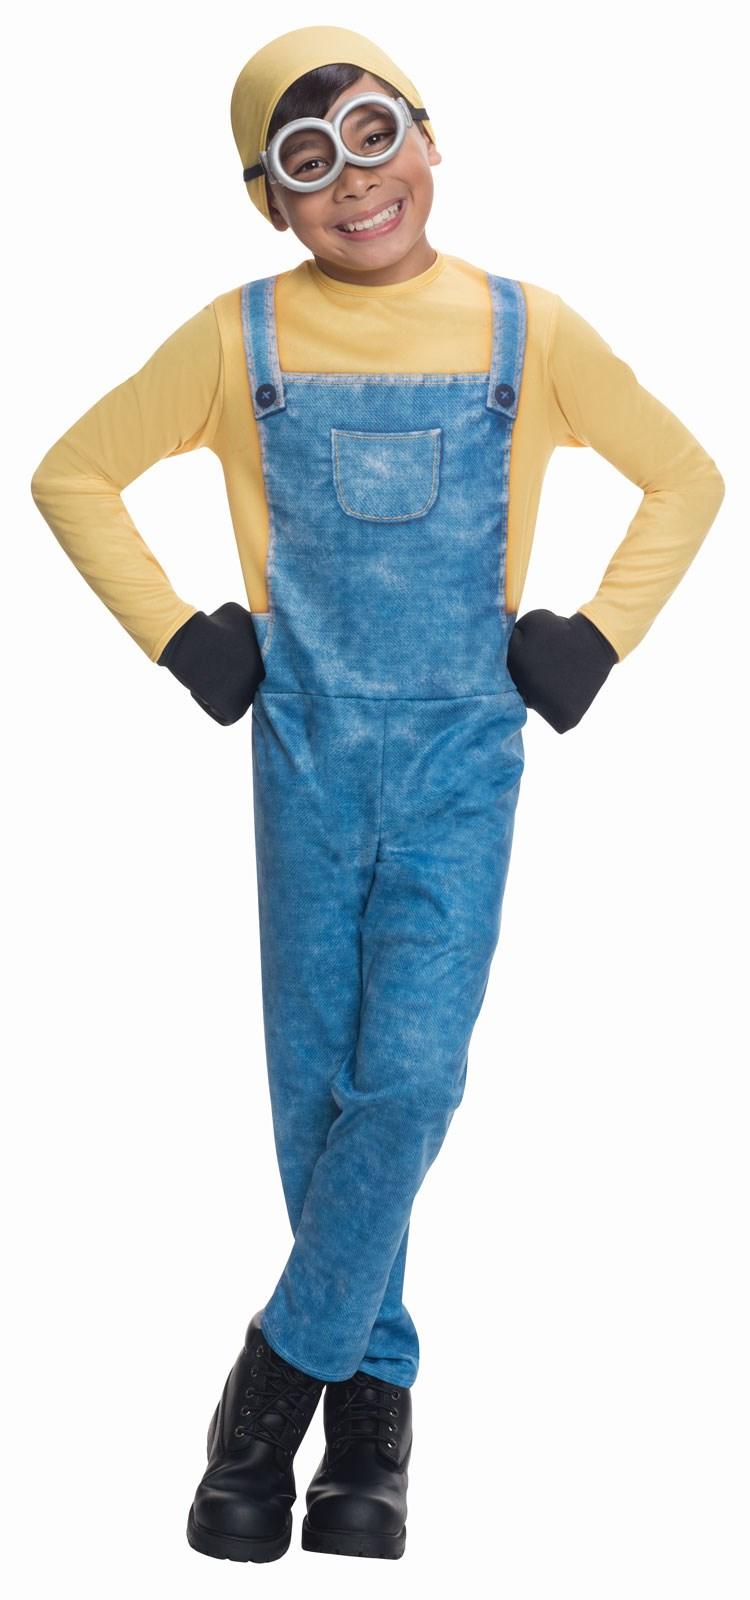 Minions Movie: Minion Bob Kids Costume